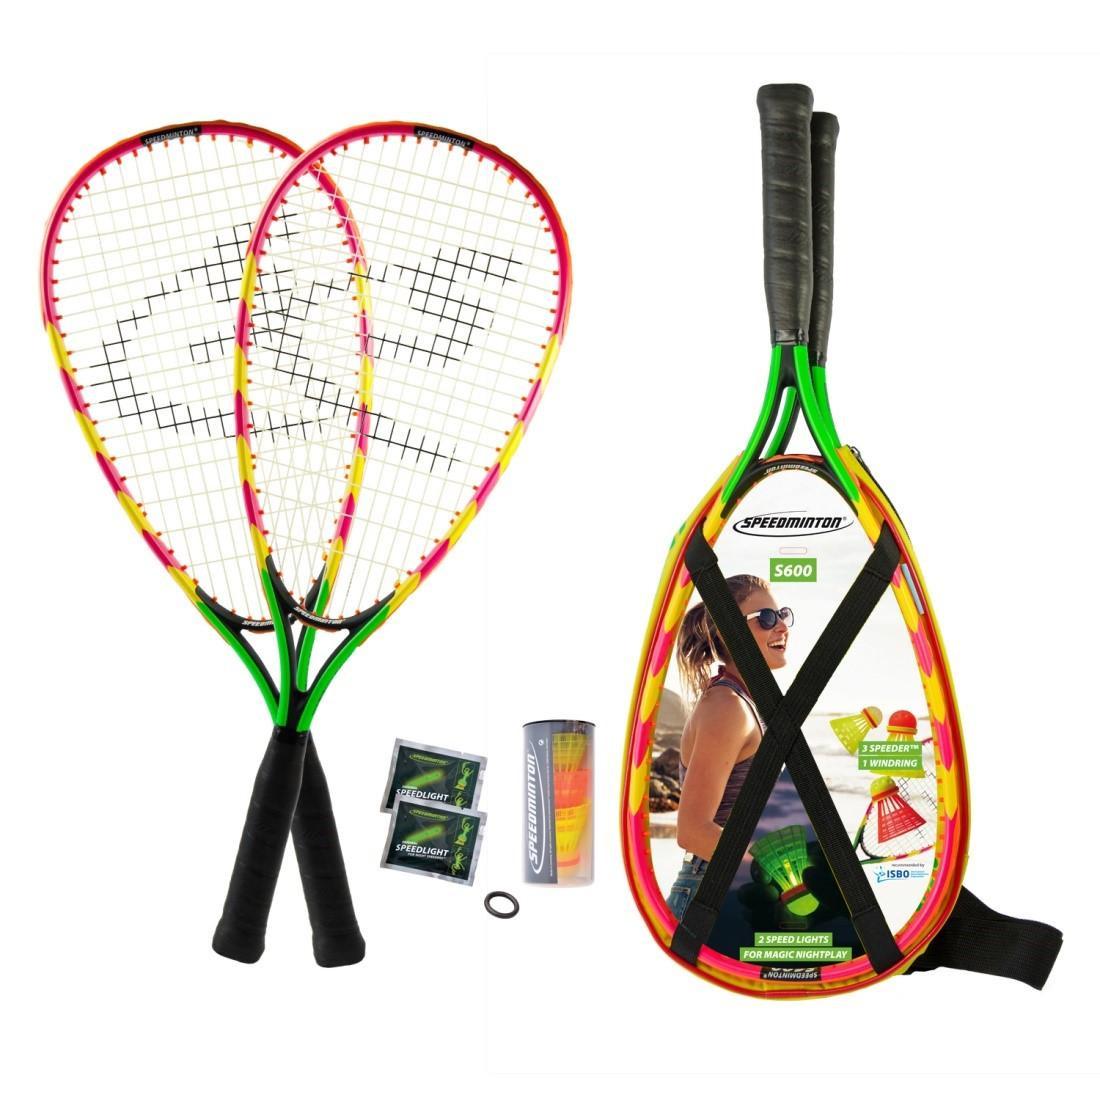 Набор для спидминтона Speedminton Set S600 Green/Yellow/Red - Интернет-магазин Sports Trend в Киеве